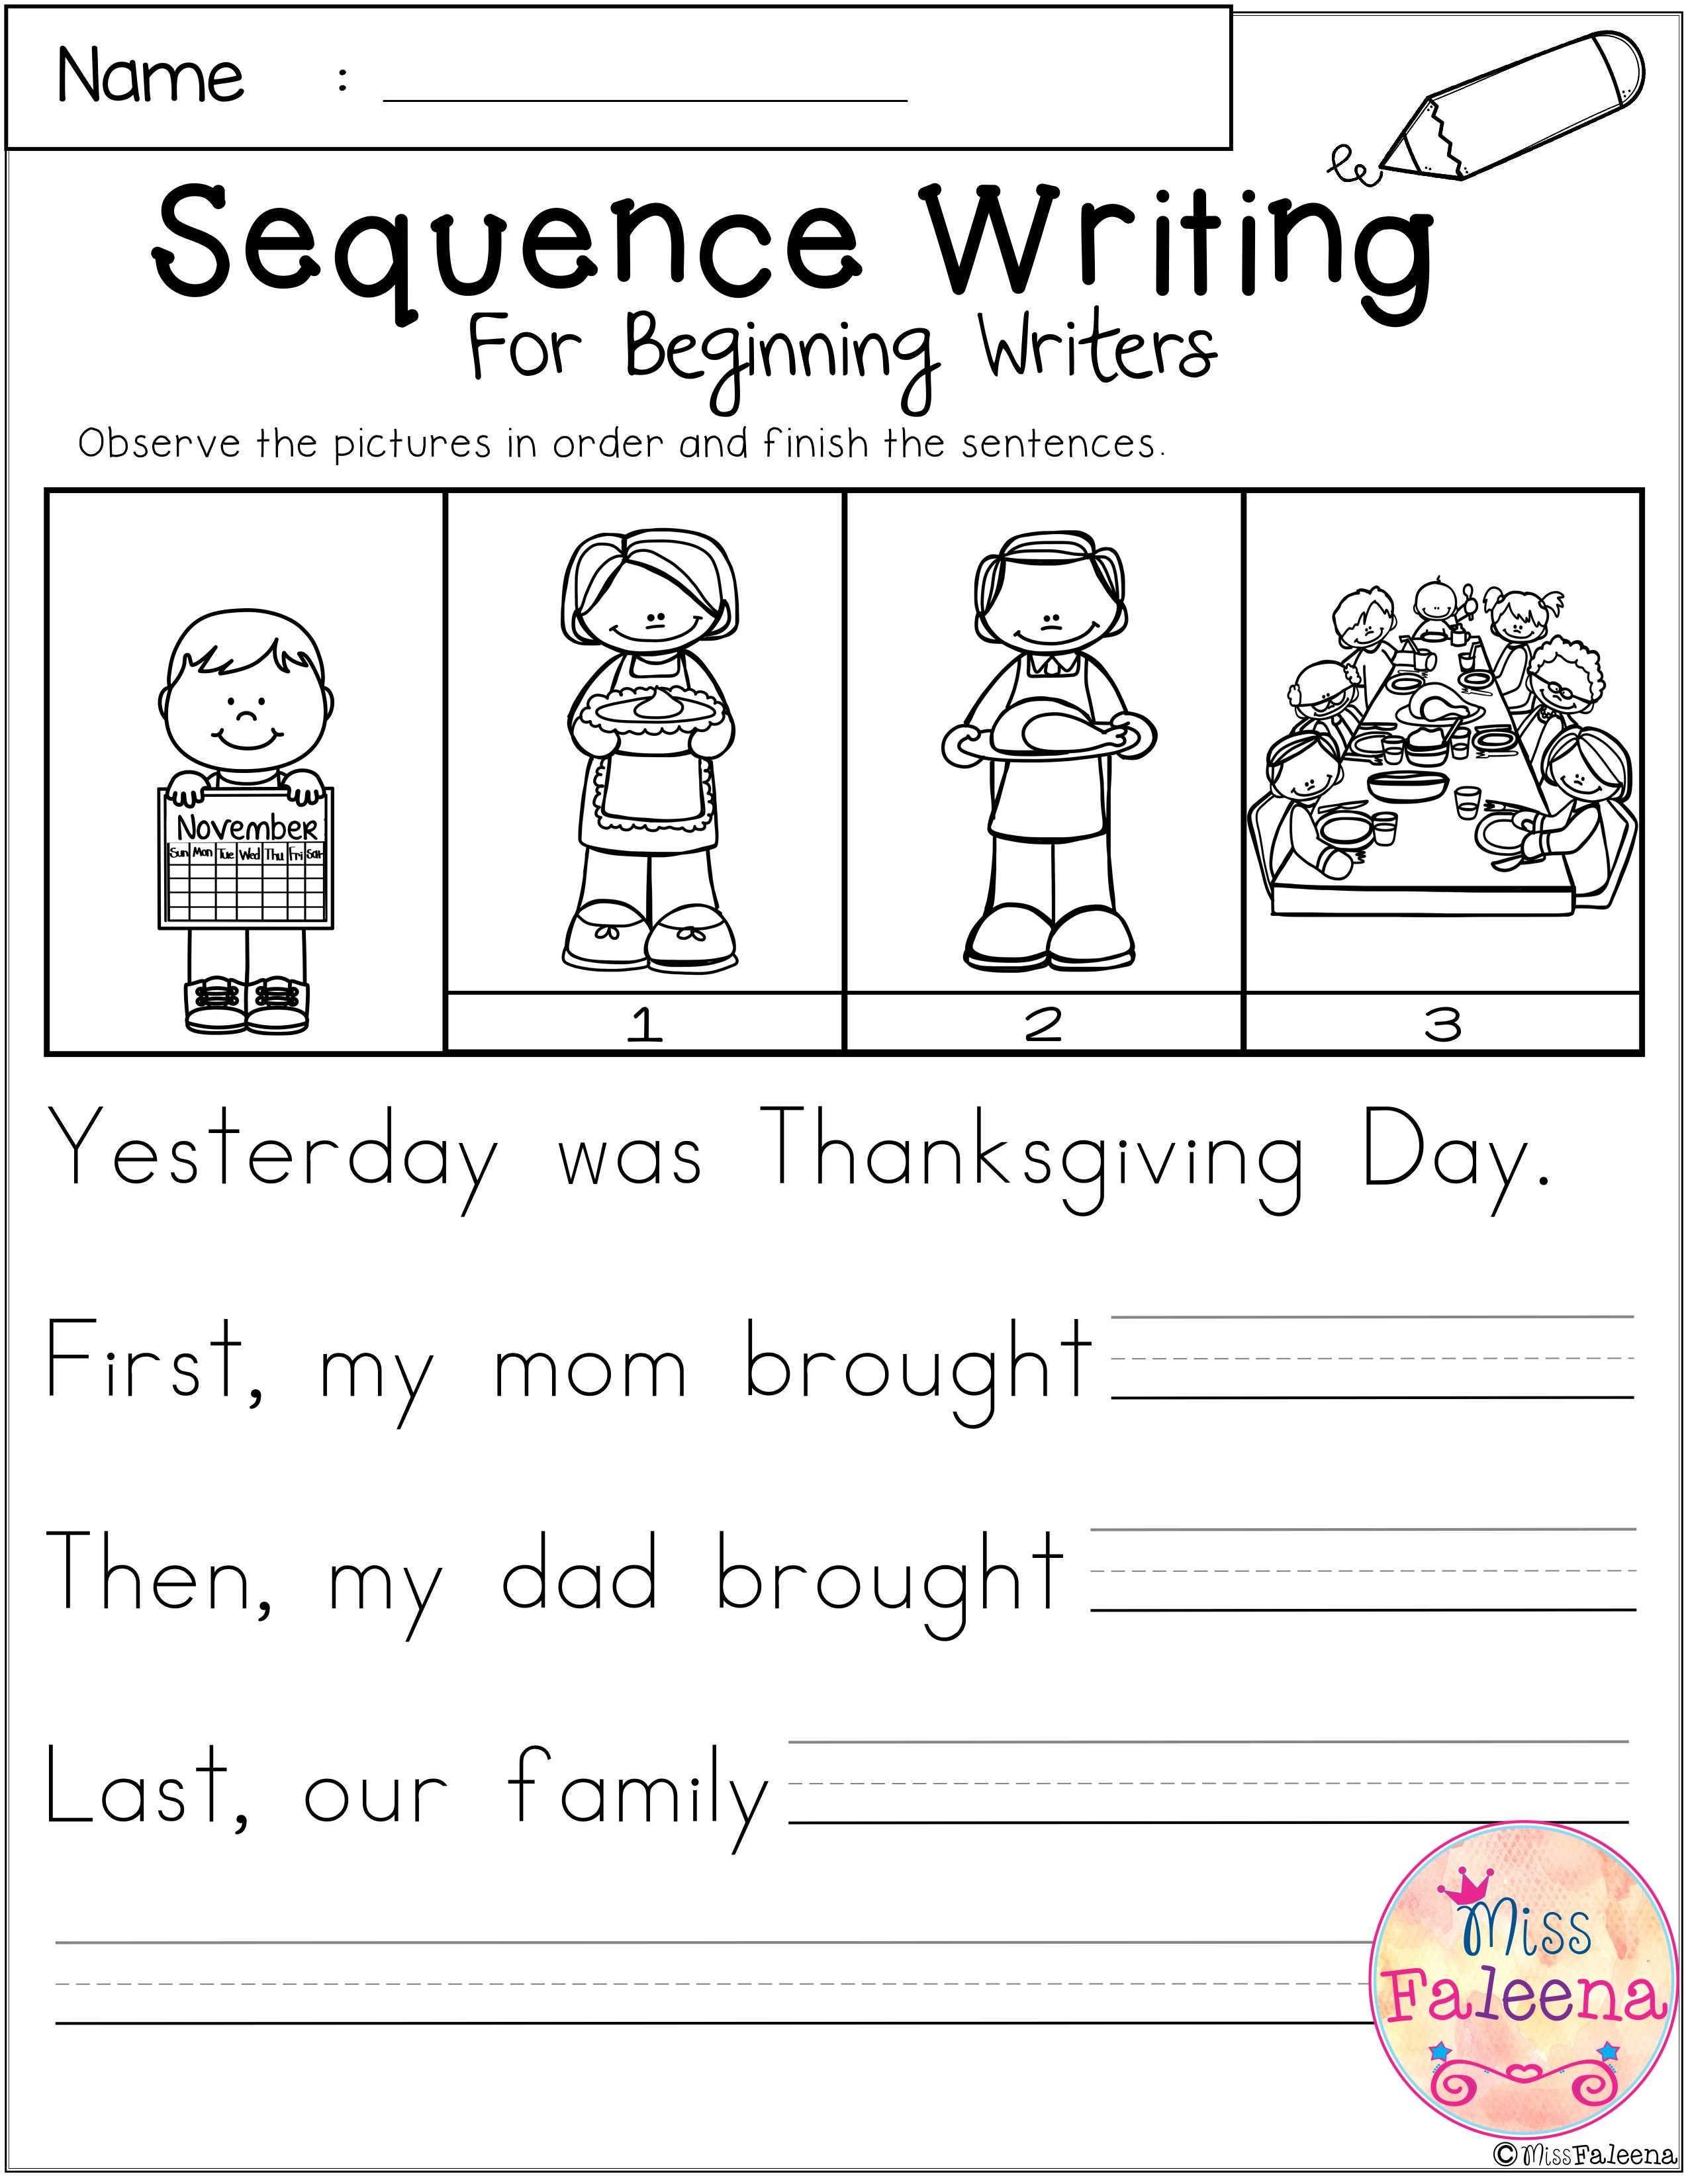 medium resolution of https://www.contohkumpulan.com/november-sequence-writing-for-beginning-writers-miss-faleena-s-store-first-grade-worksheets/